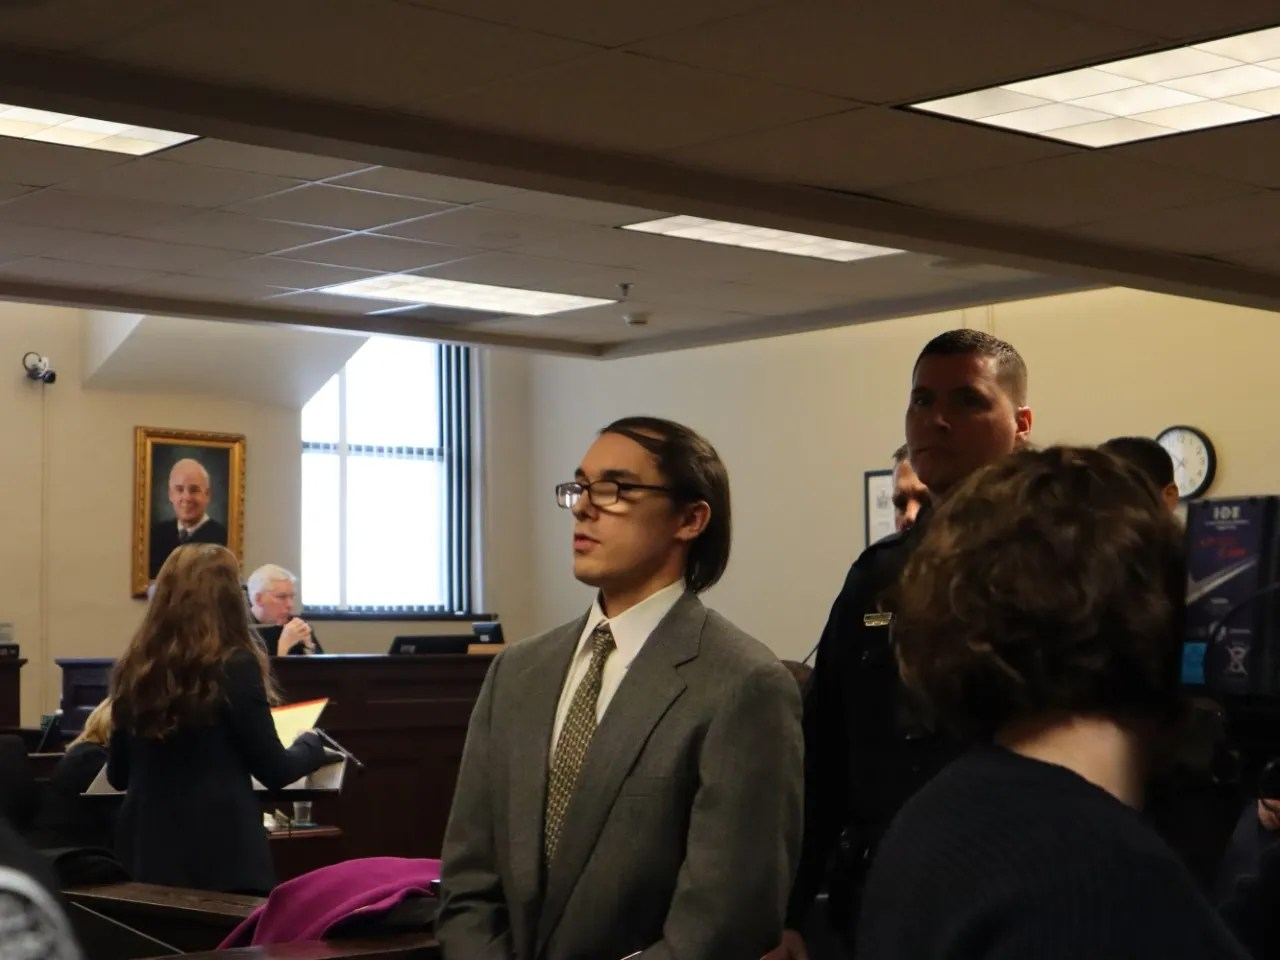 Bianca Devins Brandon Clark Pleads Guilty In New York